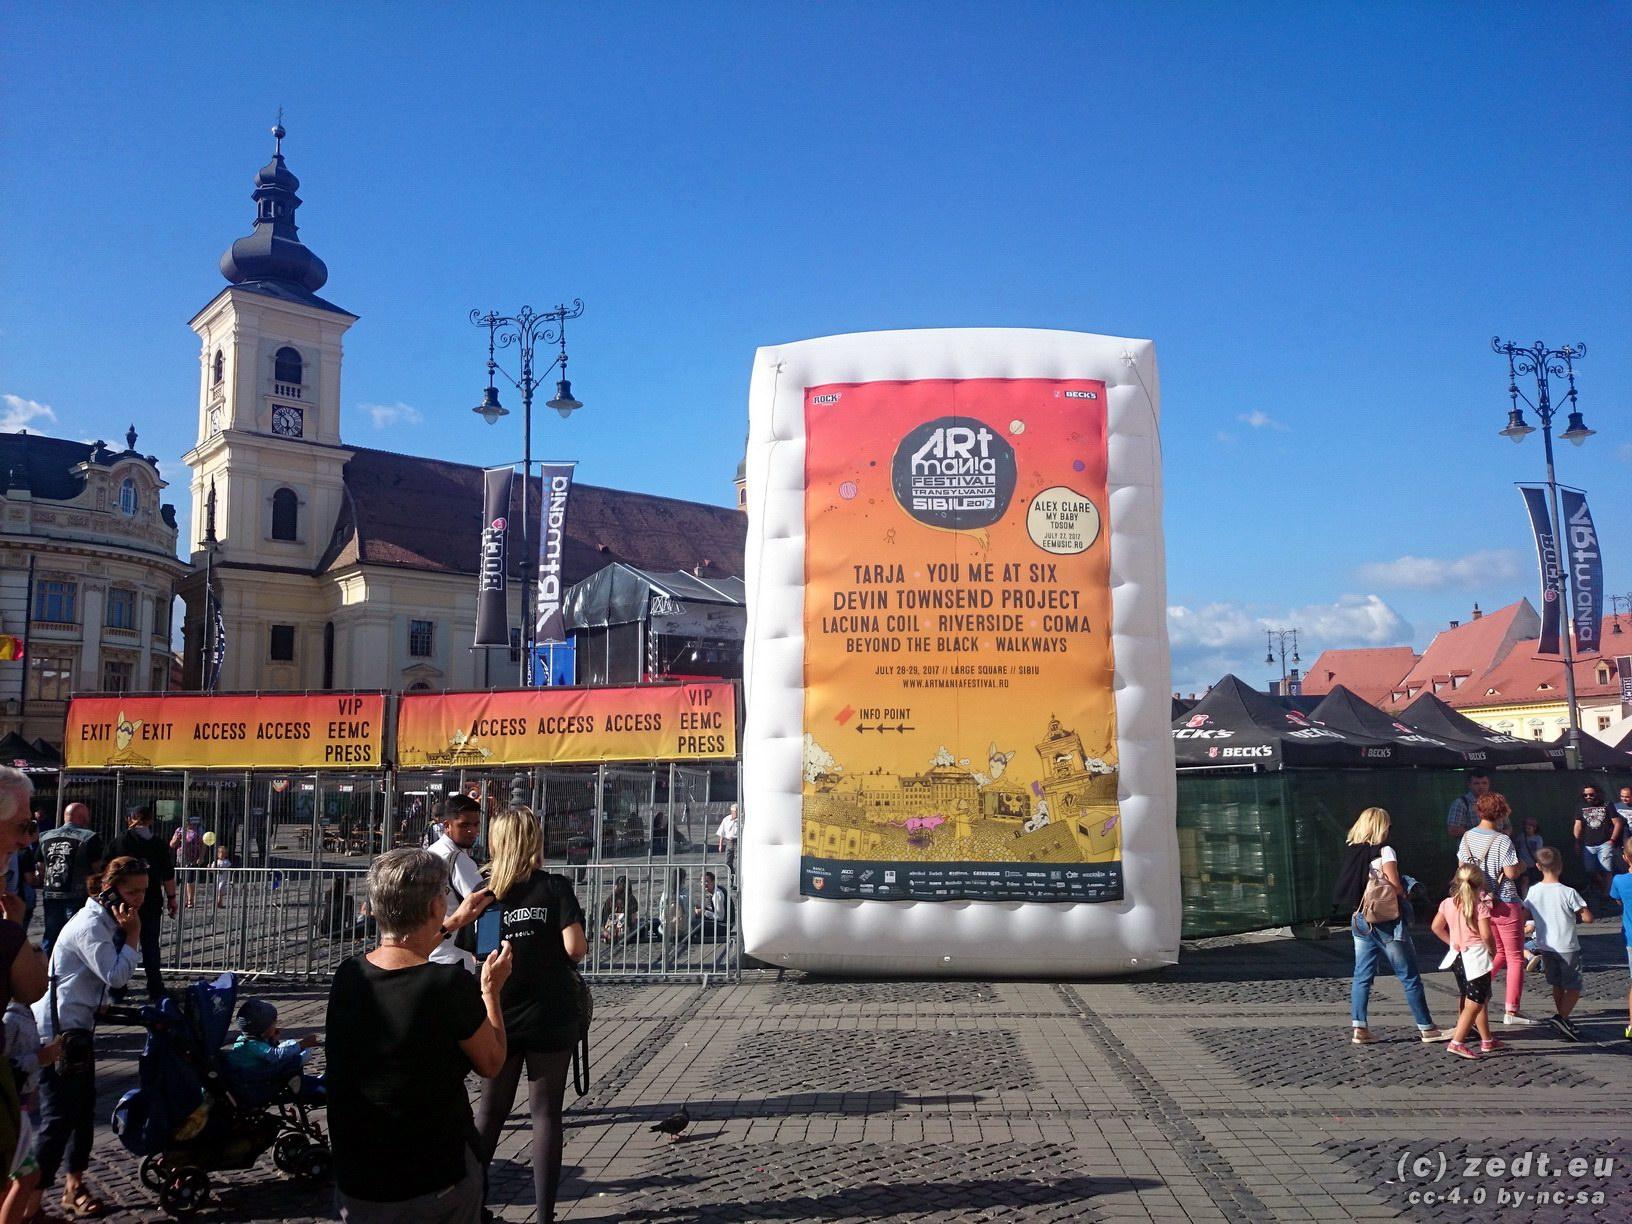 Artmania Festival 2017